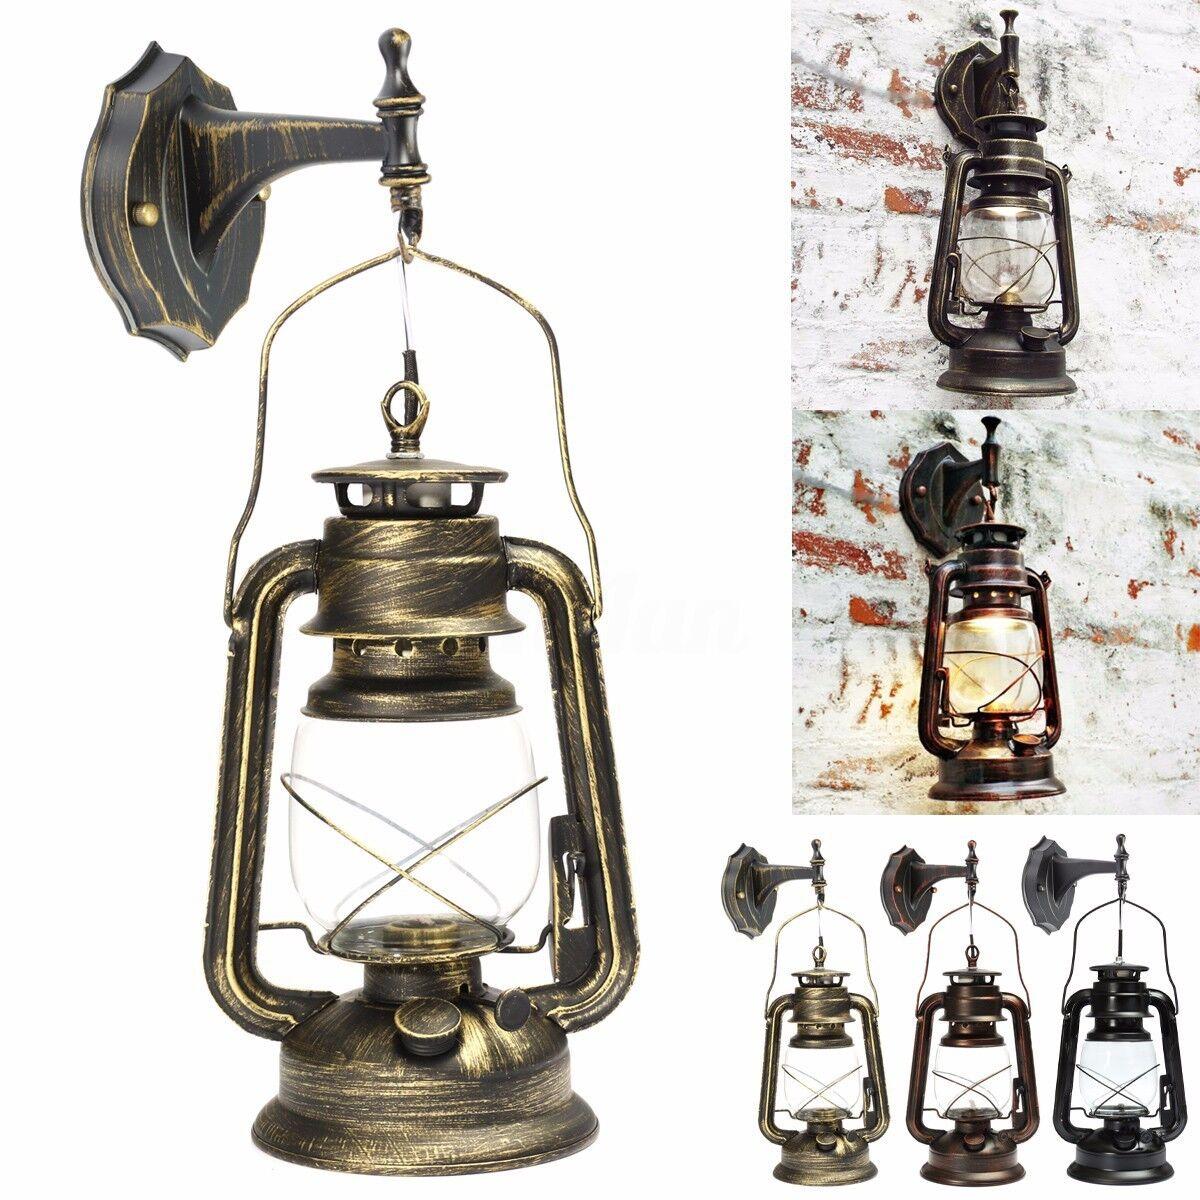 Retro Lanterna Applique Lampada Parete Muro da Esterno Luce LED Bulbo/Cherosene